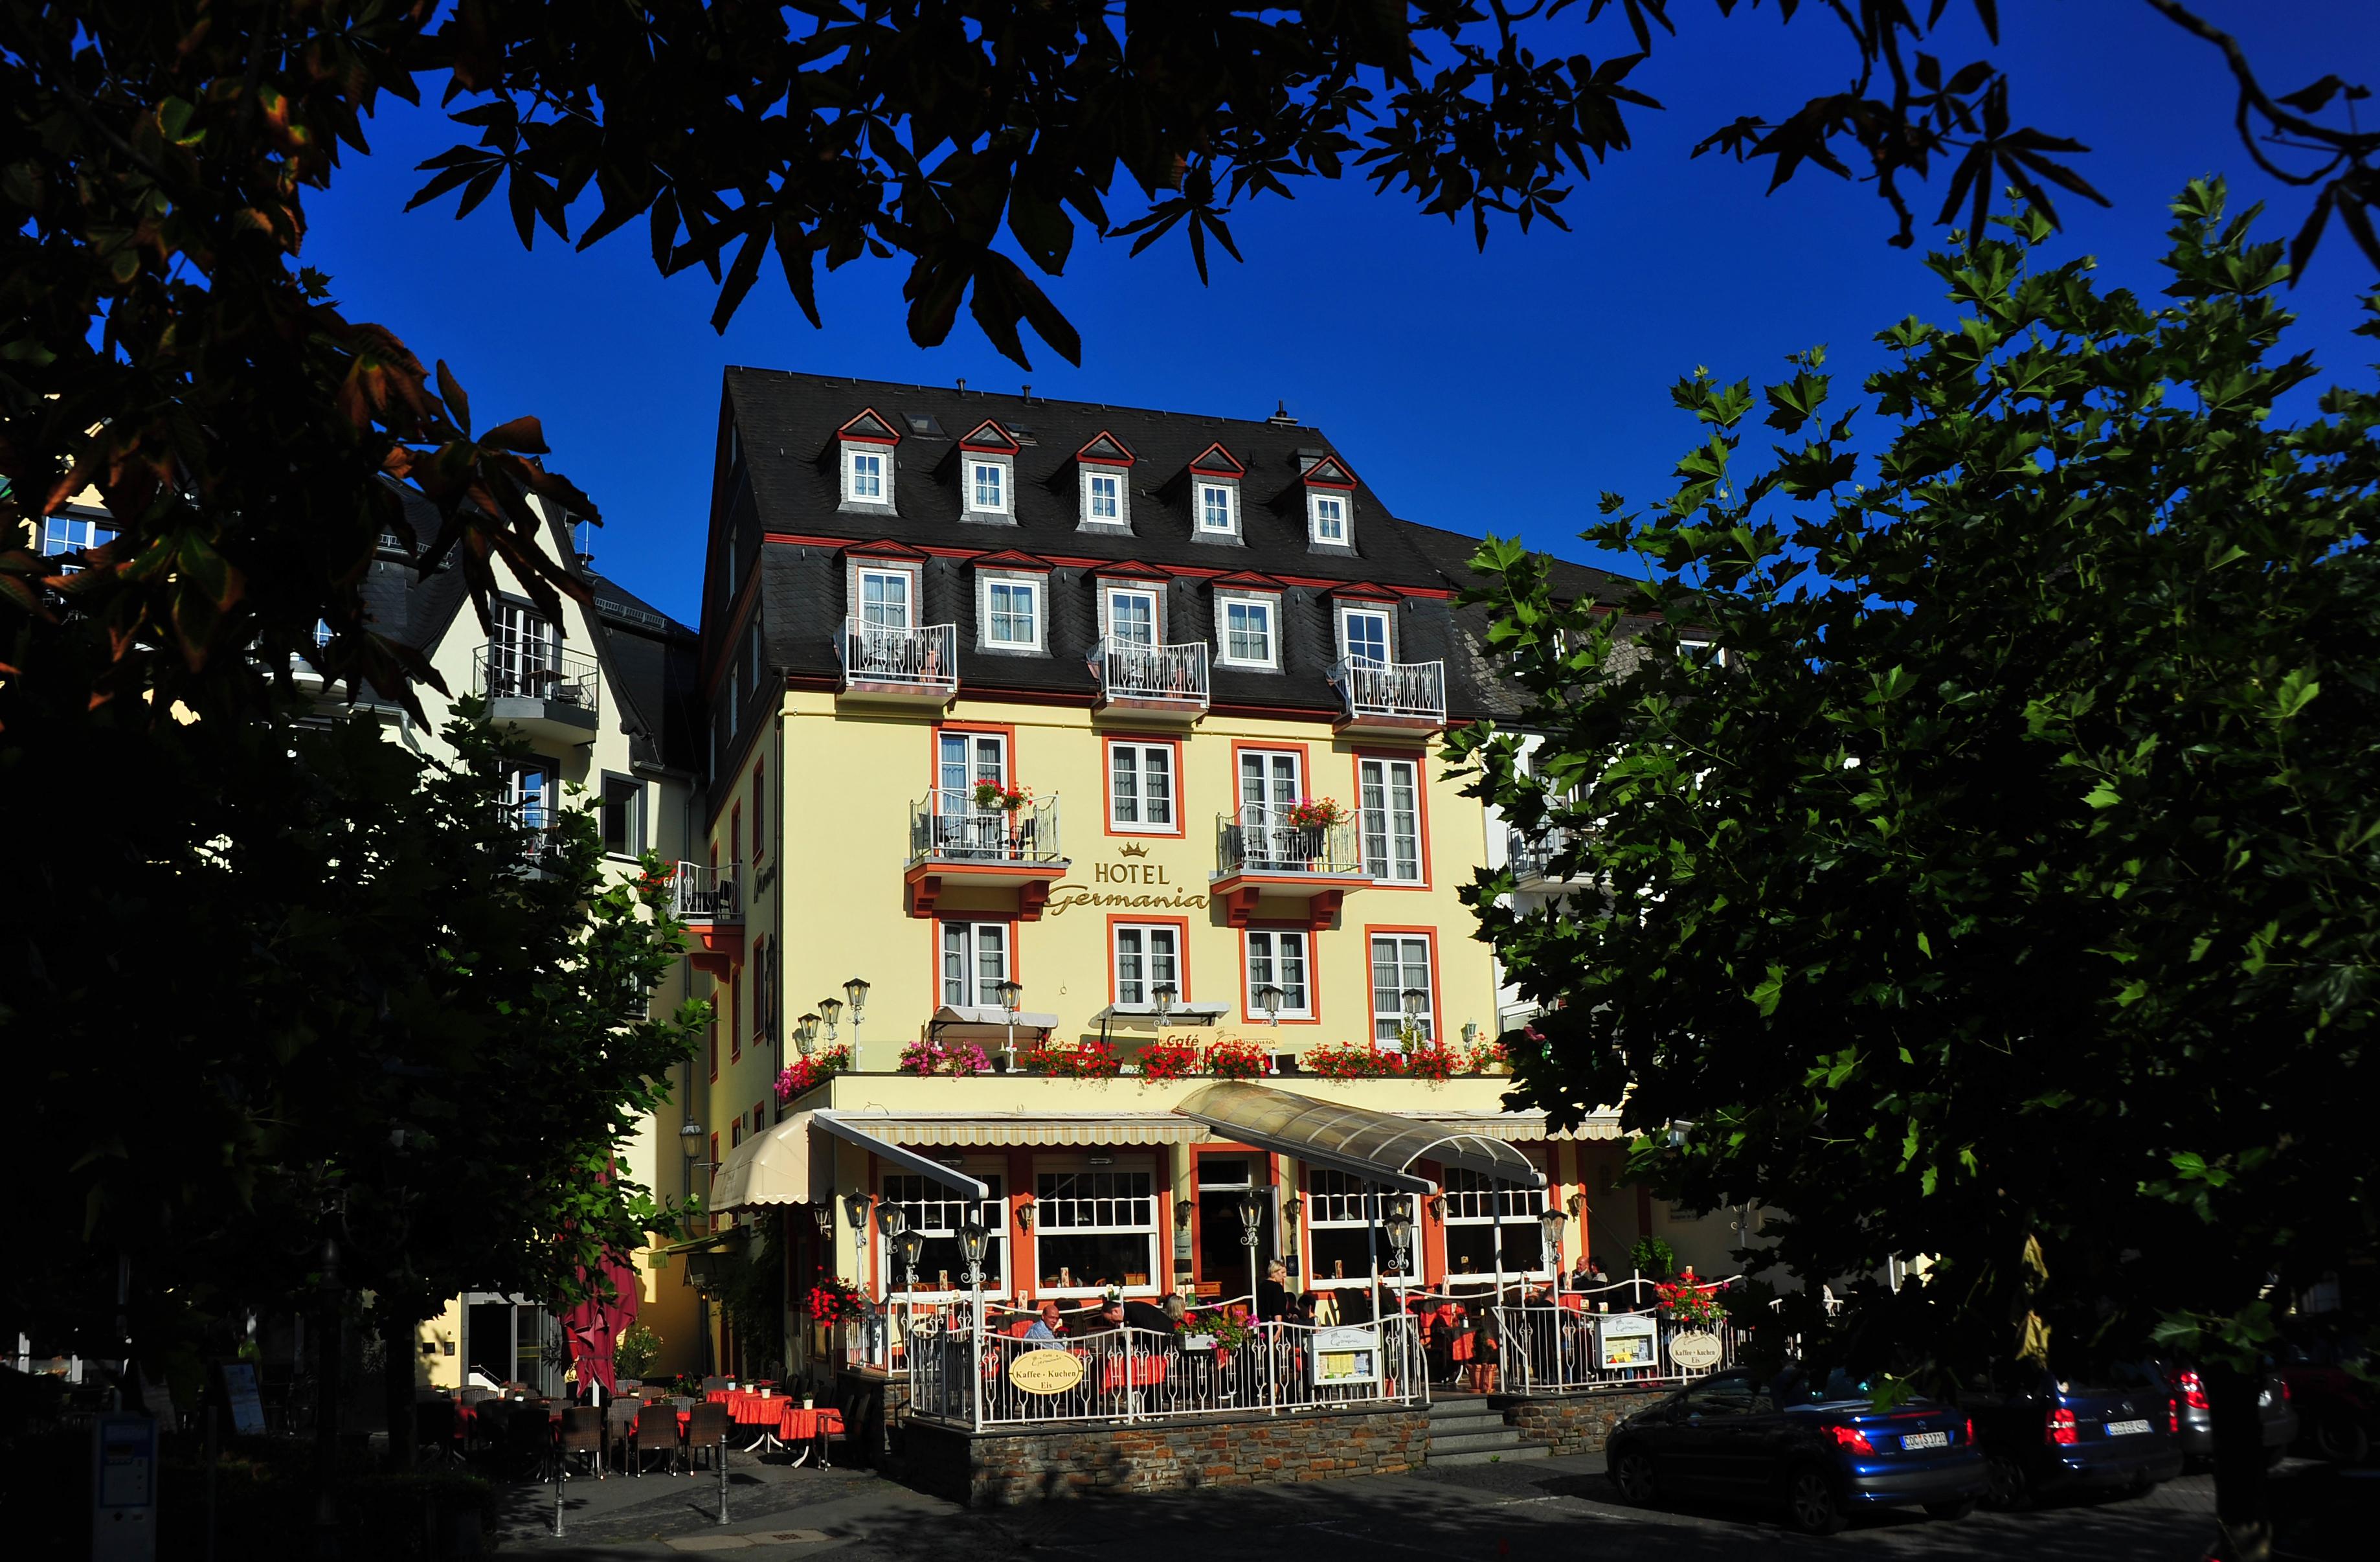 Hotel Germania Cochem Moezel